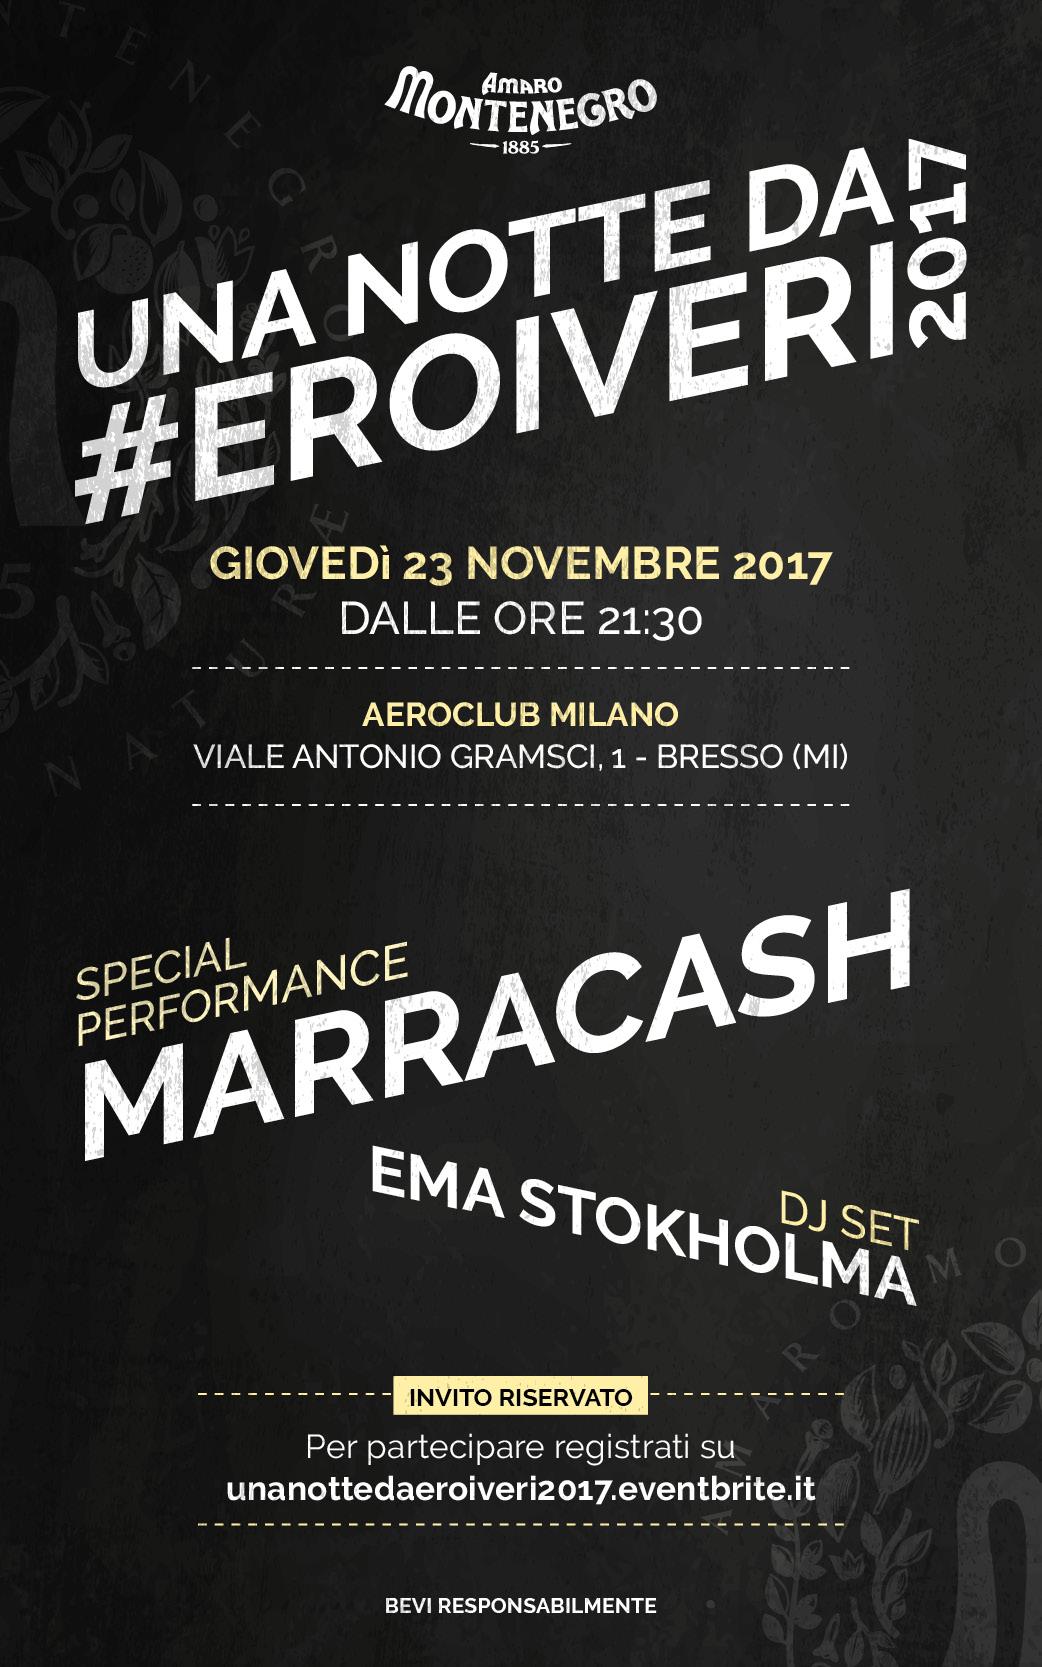 UNA NOTTE DA #EROIVERI 2017